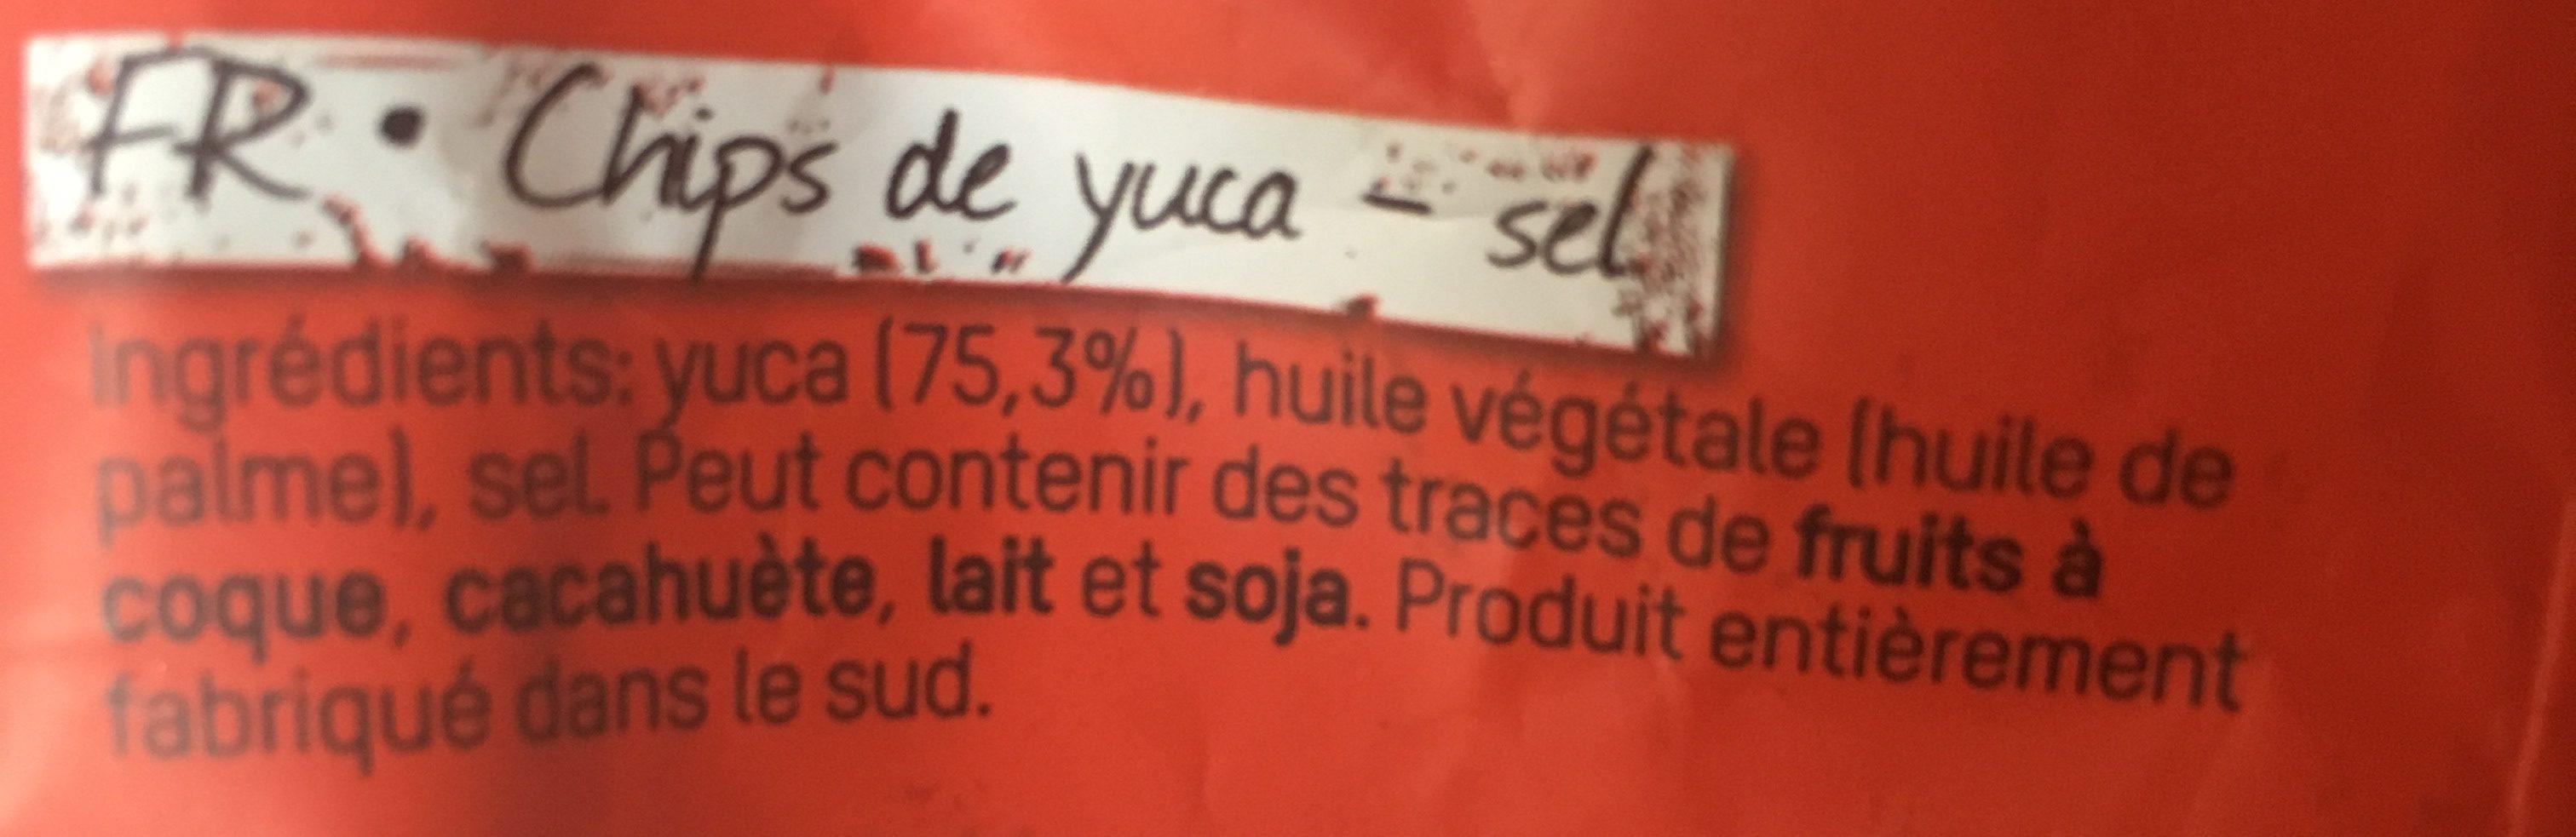 Yuca Chips - Ingredients - fr